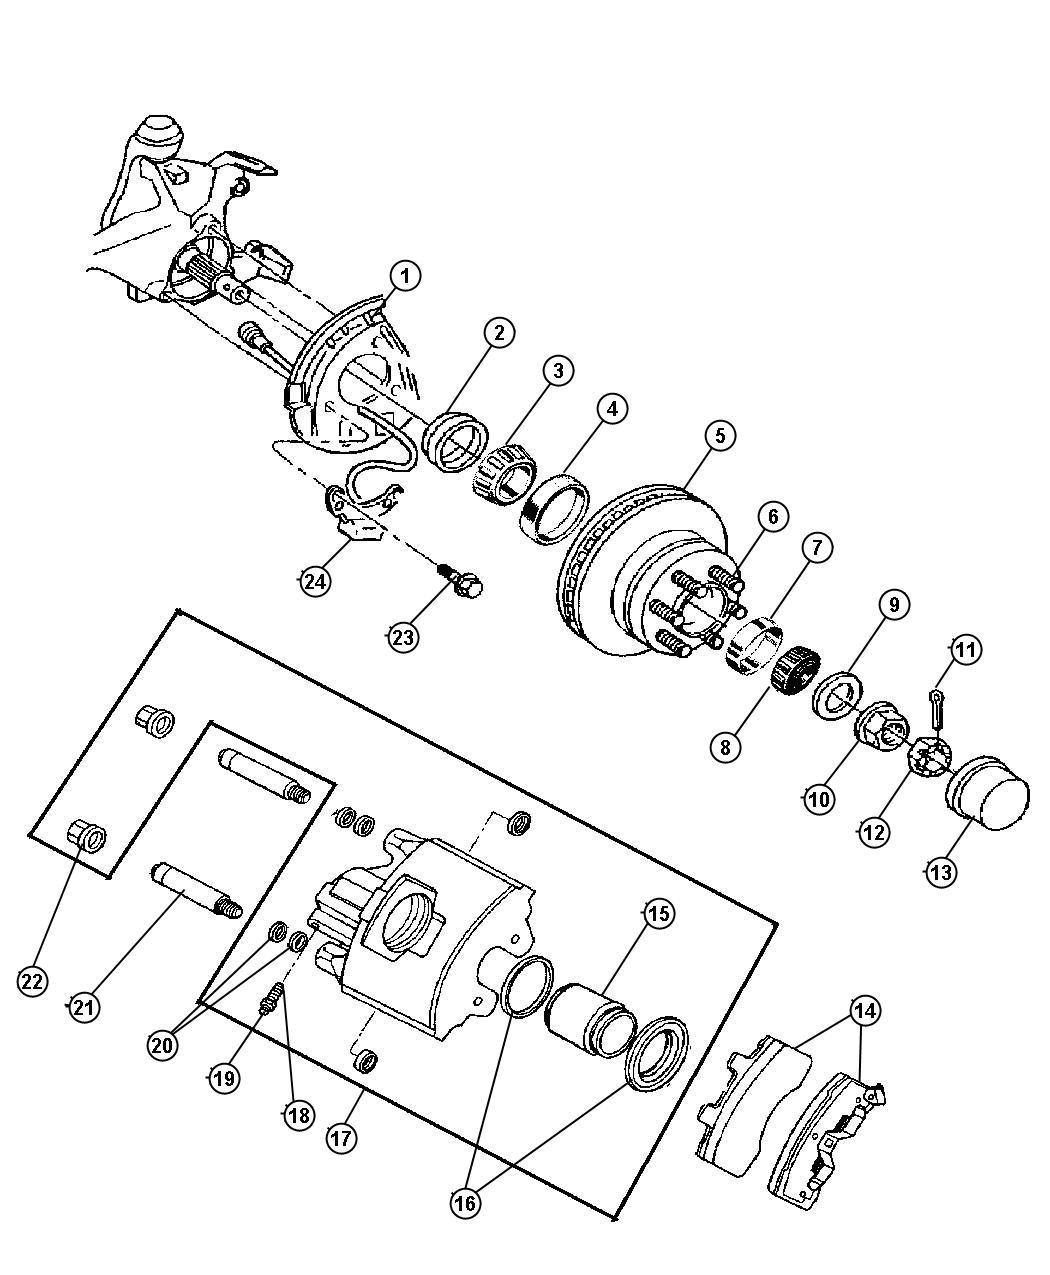 tags: #1994 chevy disc brake diagrams#dana 60 front brake diagram#front disk  brake diagram#drum brake diagram#disc brake assembly diagram#brake caliper